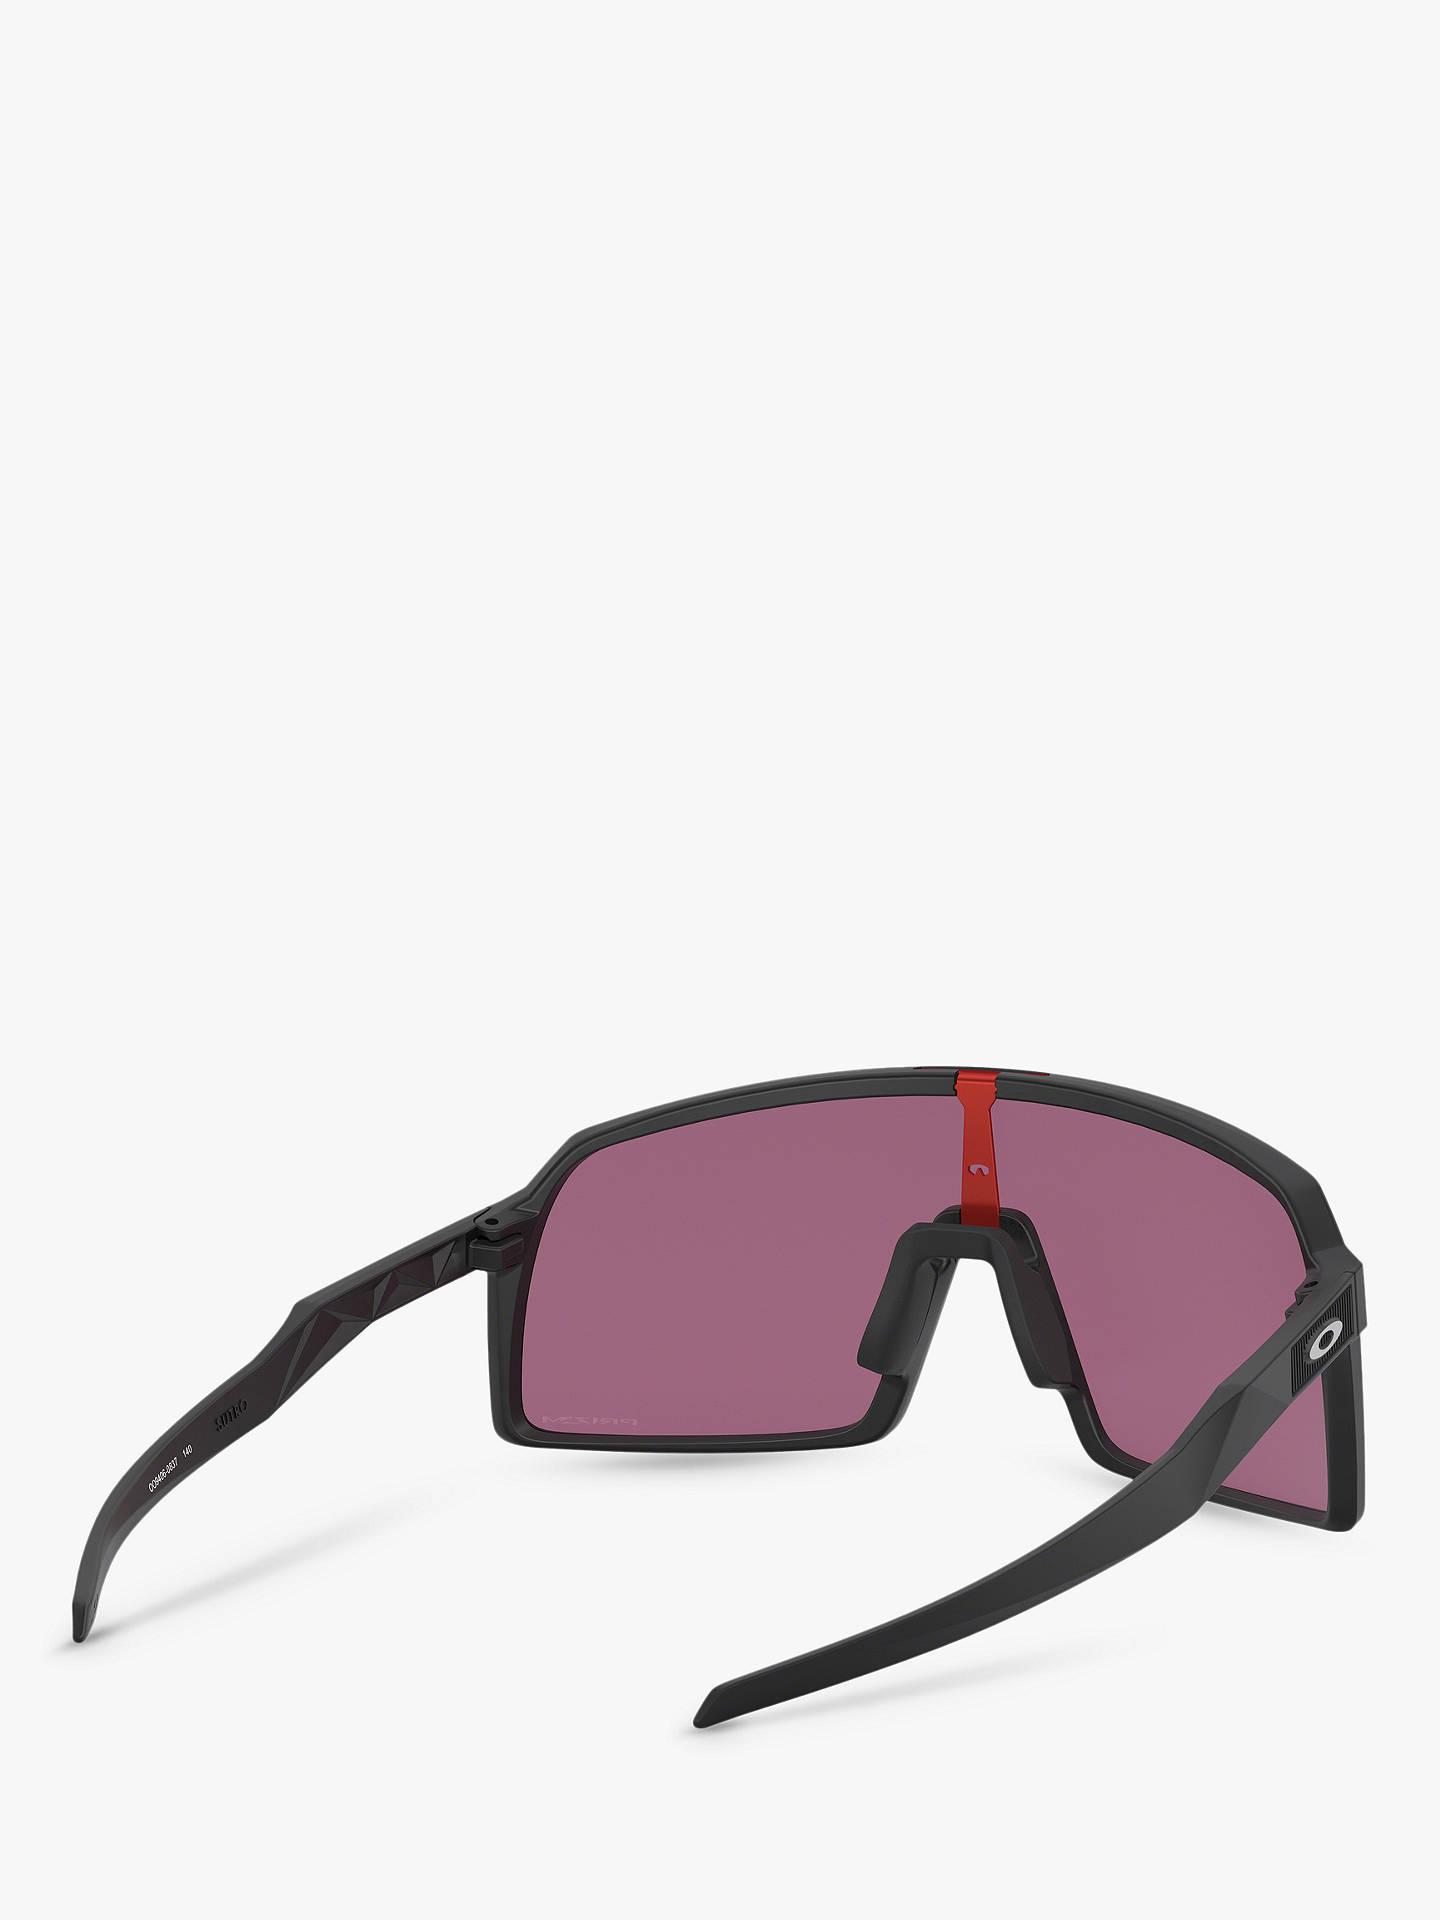 e31ff430121e8 Oakley OO9406 Men s Sutro Prizm Rectangular Sunglasses at John Lewis ...